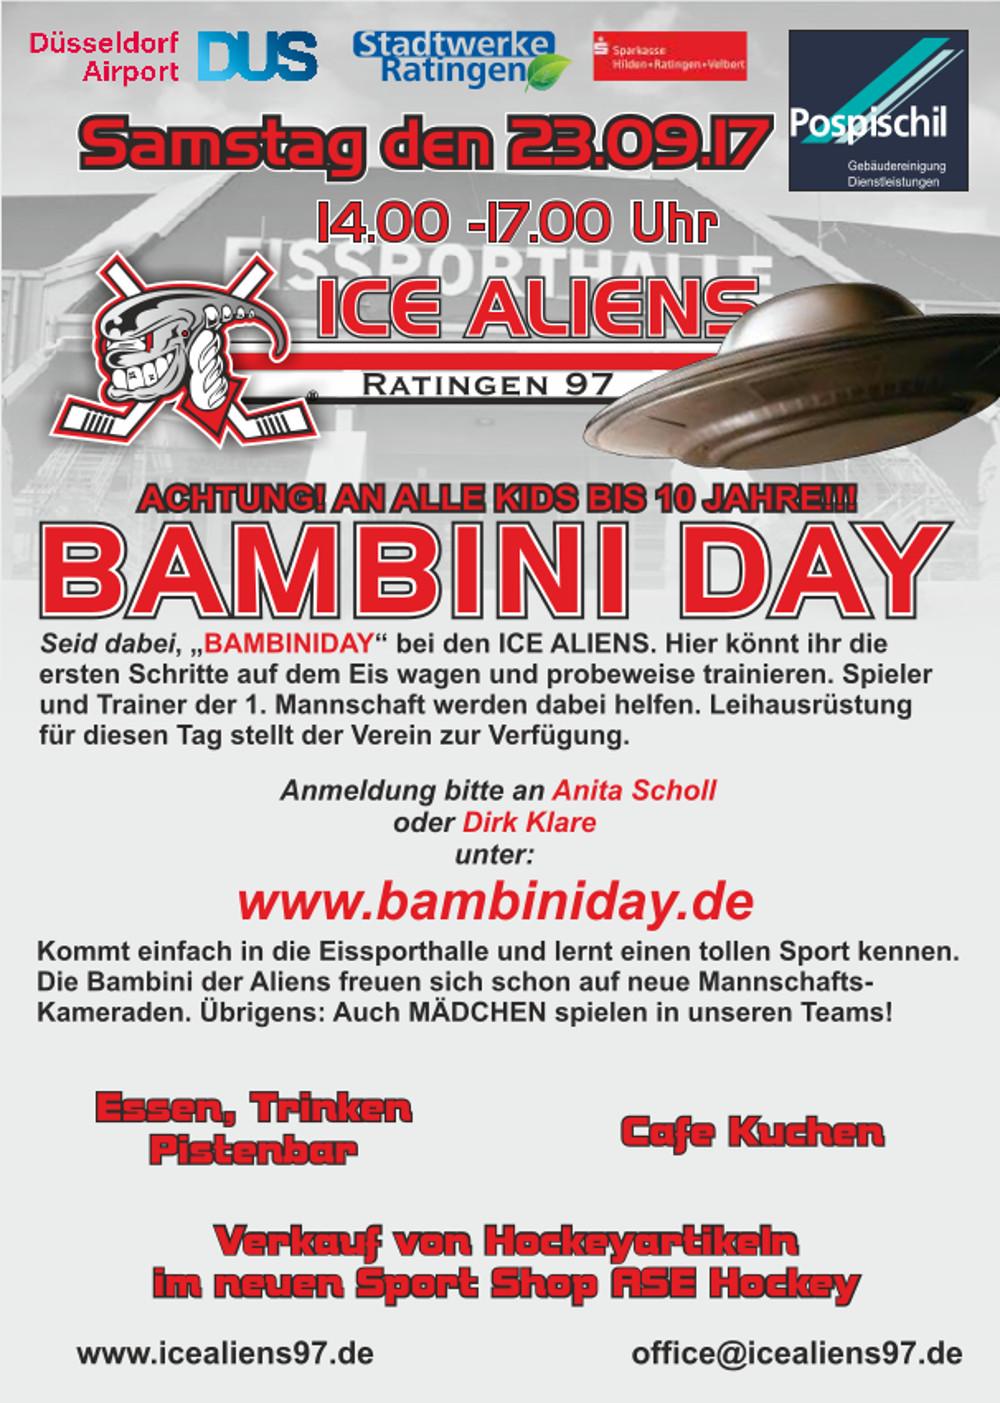 Heiß auf Eis!? Bambini-Day bei den Ratinger Ice Aliens!